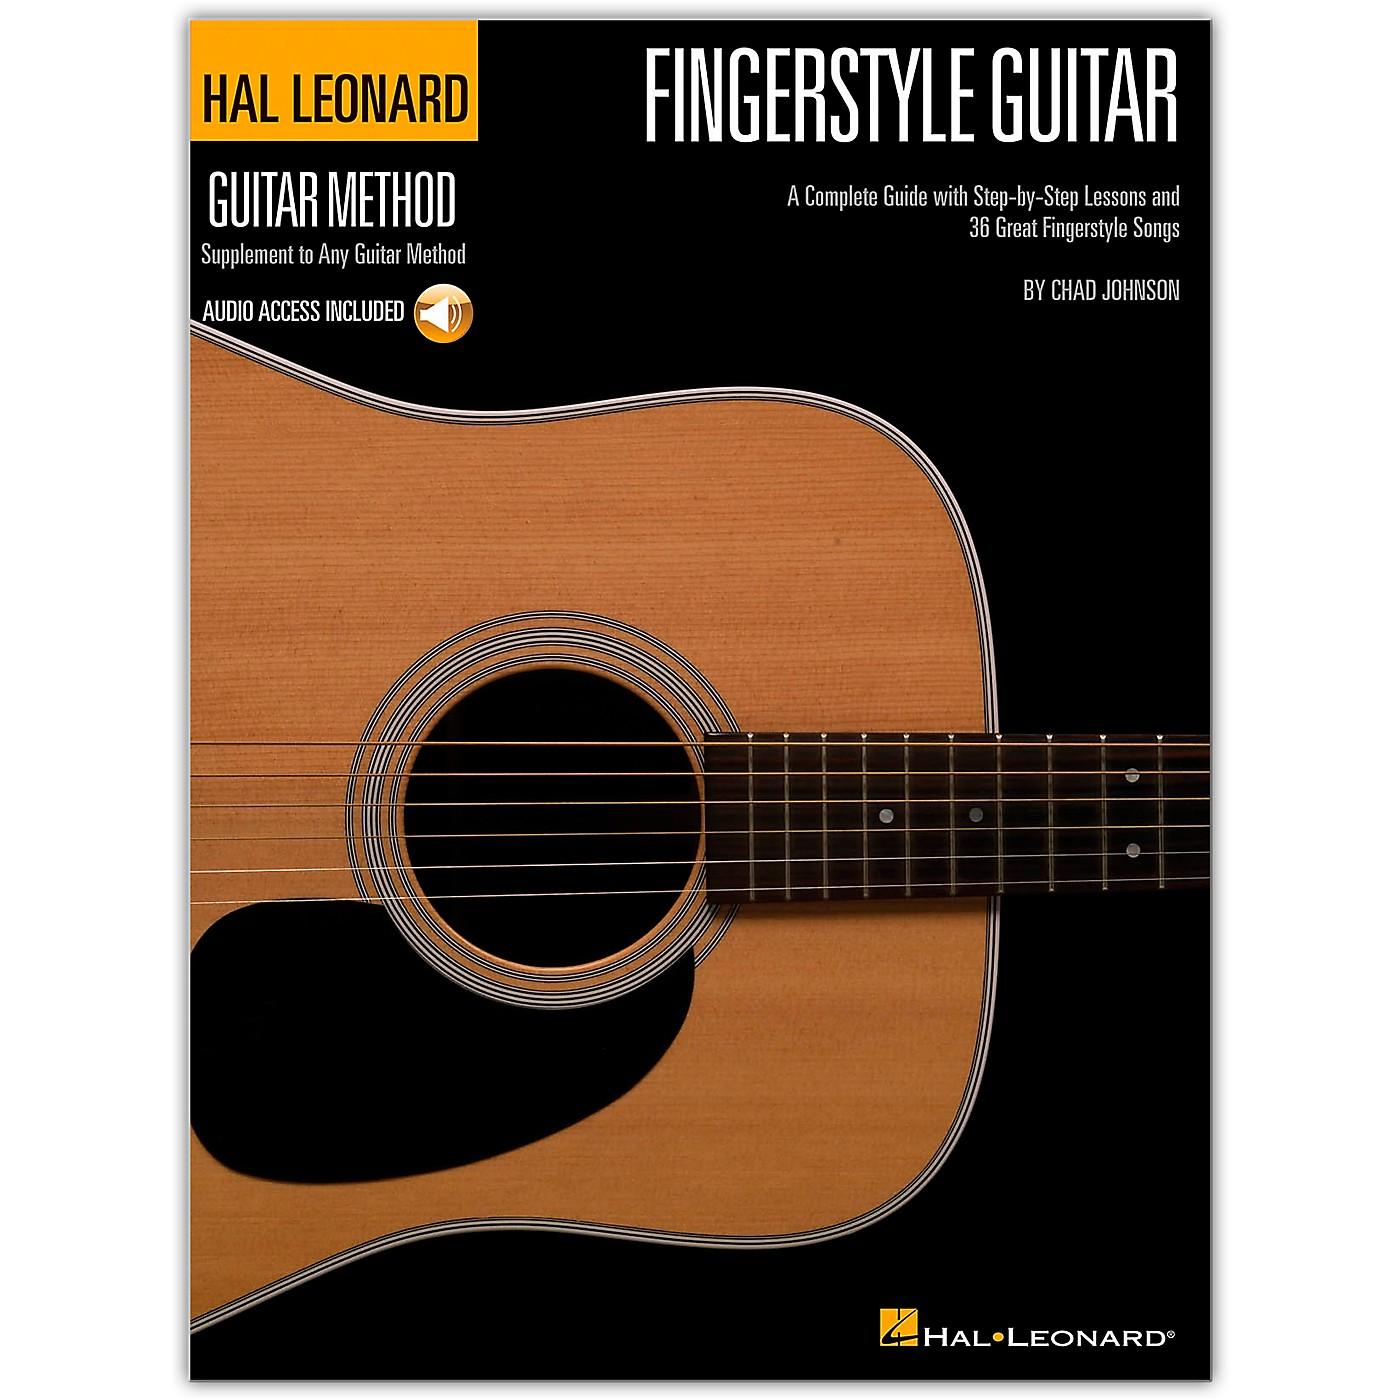 Hal Leonard Fingerstyle Guitar Method - Stylistic Supplement To The Hal Leonard Guitar Method (Book/Online Audio) thumbnail